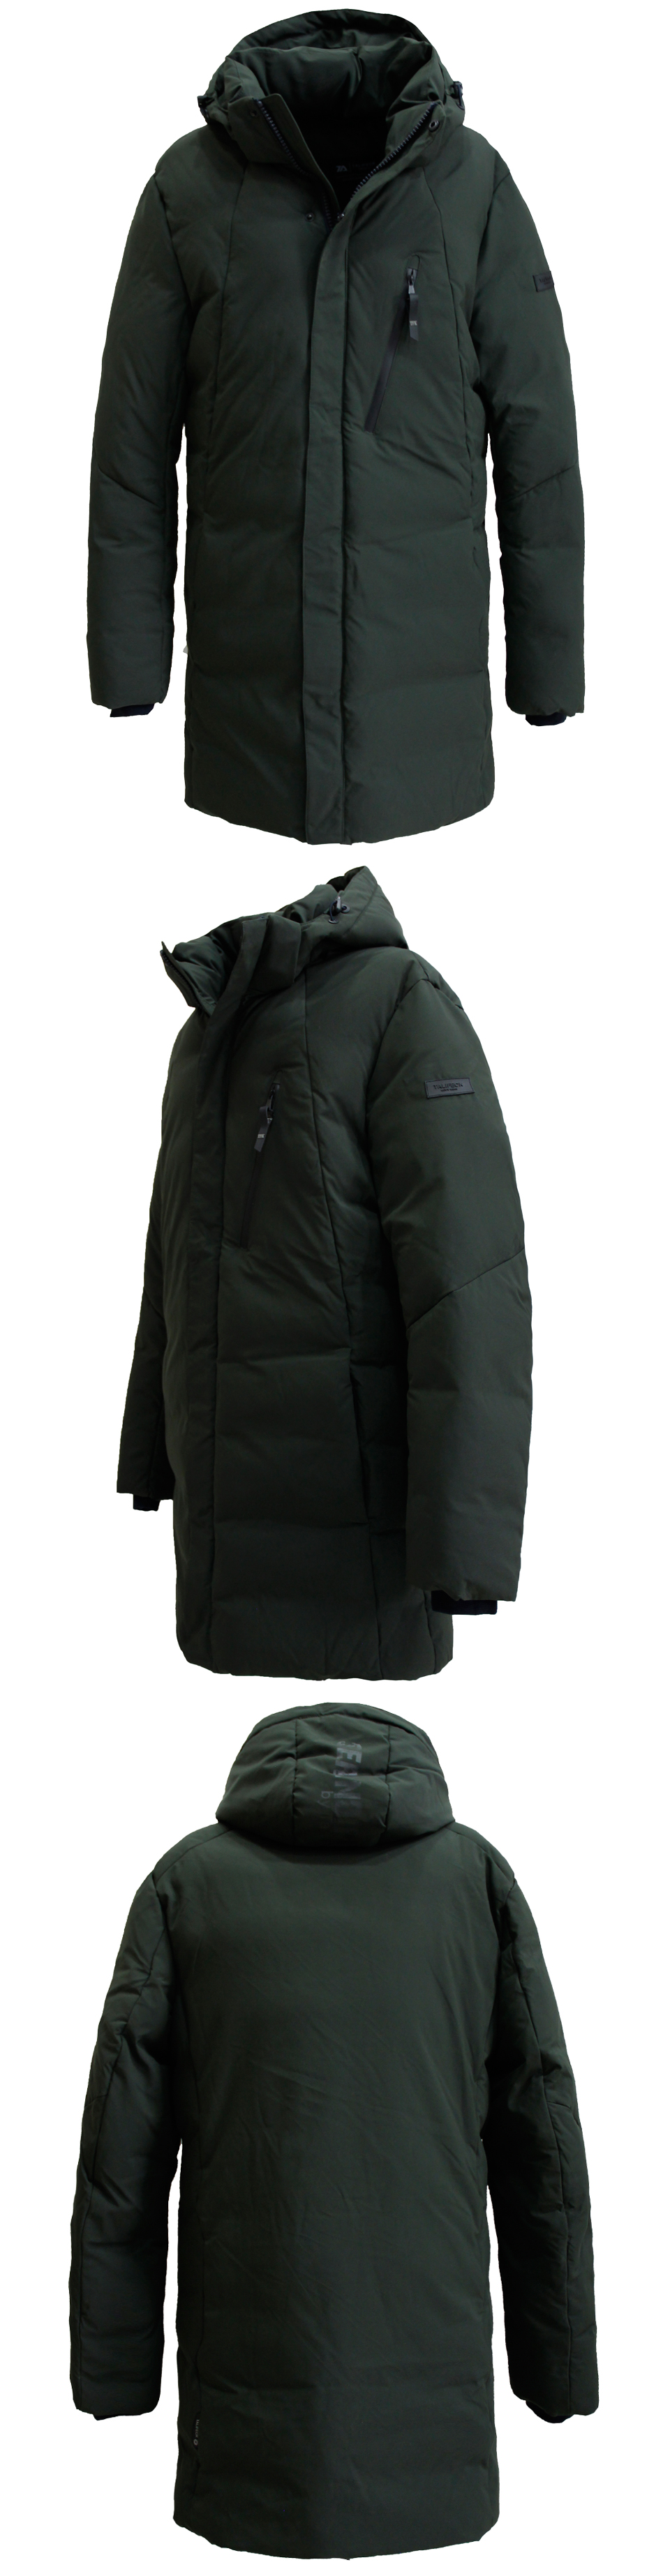 Padded Coat 1 (4)